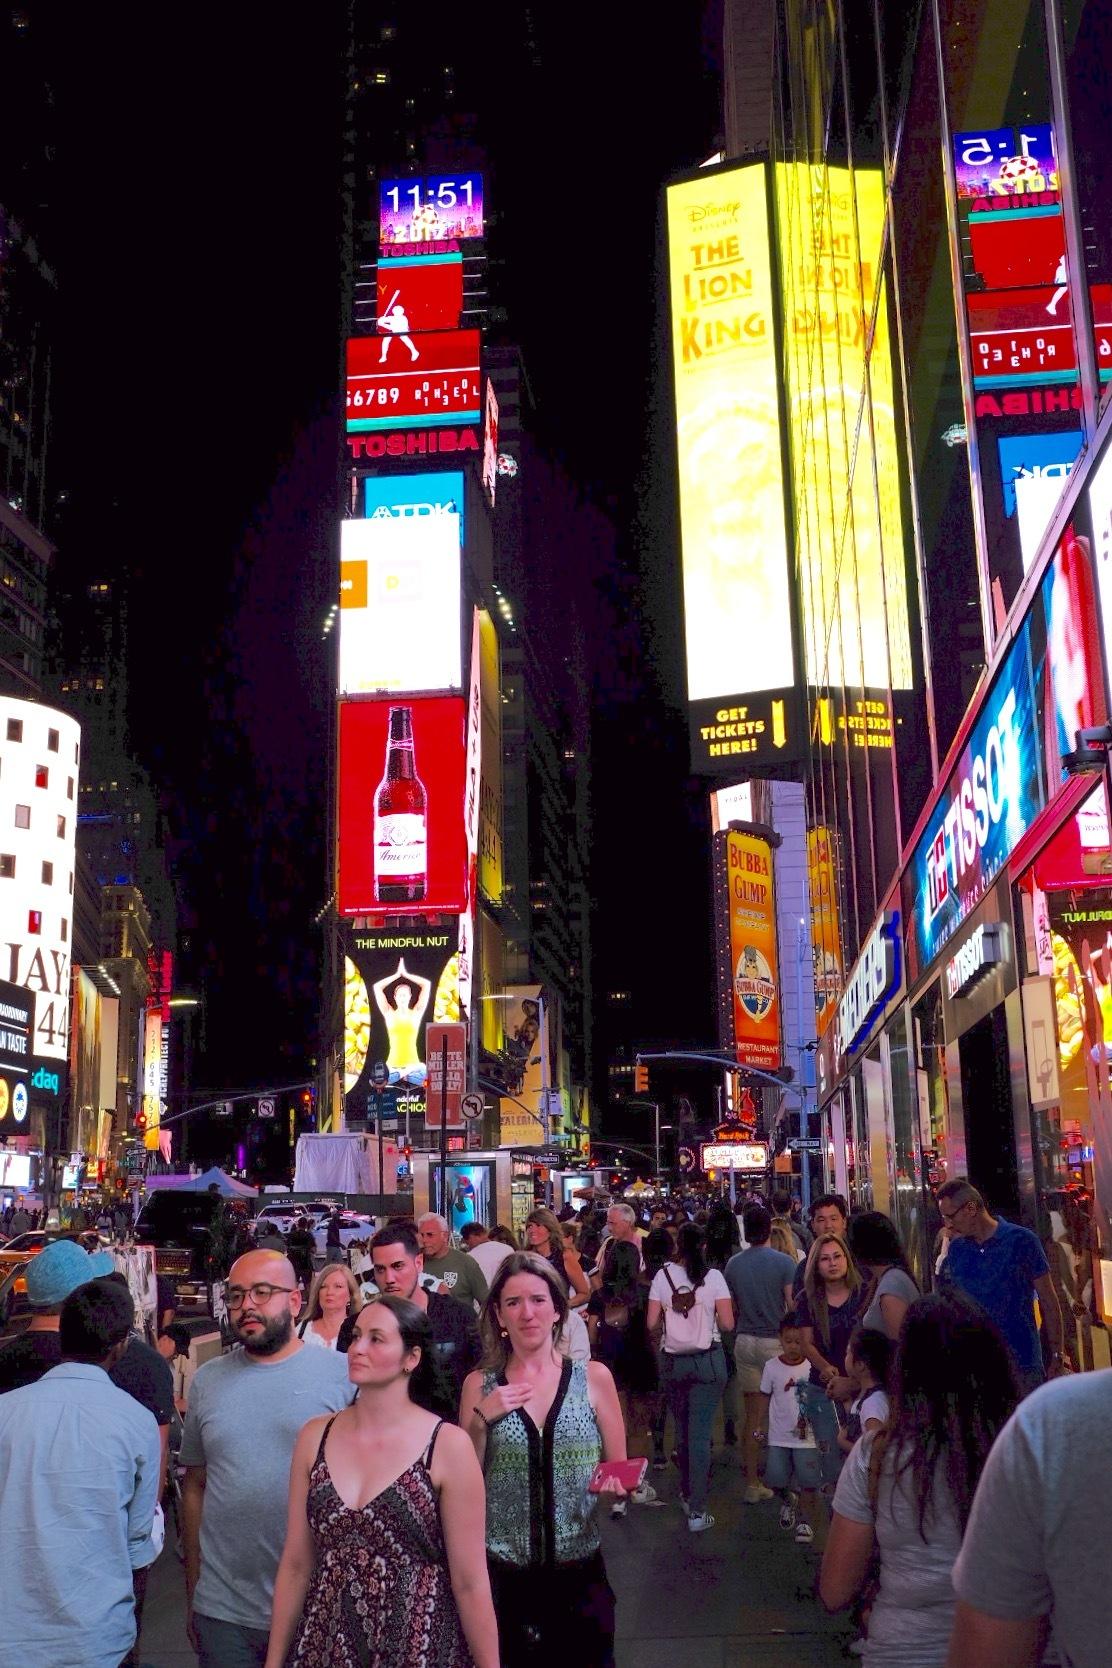 NYC Crowd by Daggy